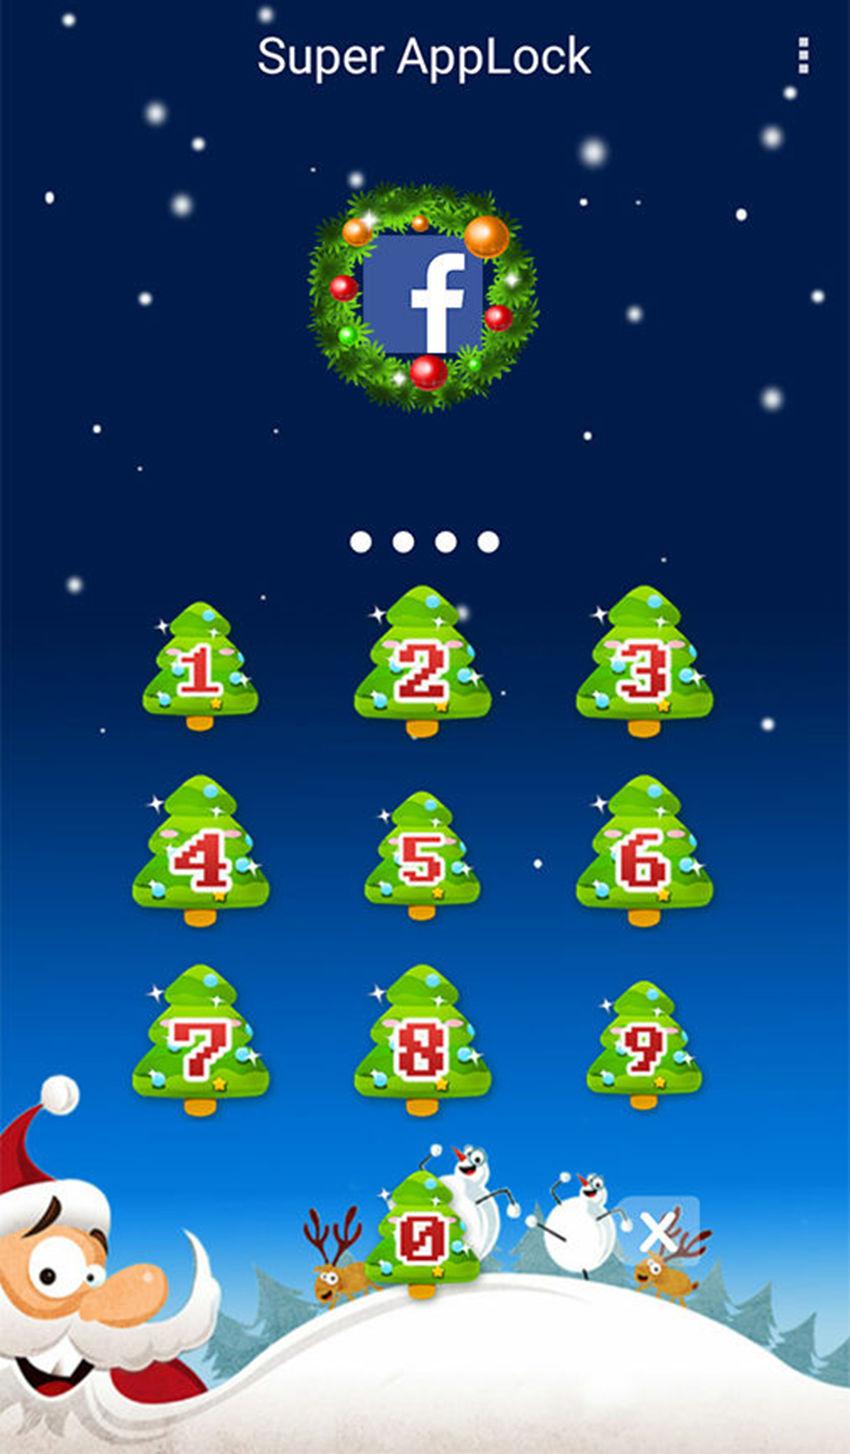 AppLock Theme Xmas Gift Wish Screenshot